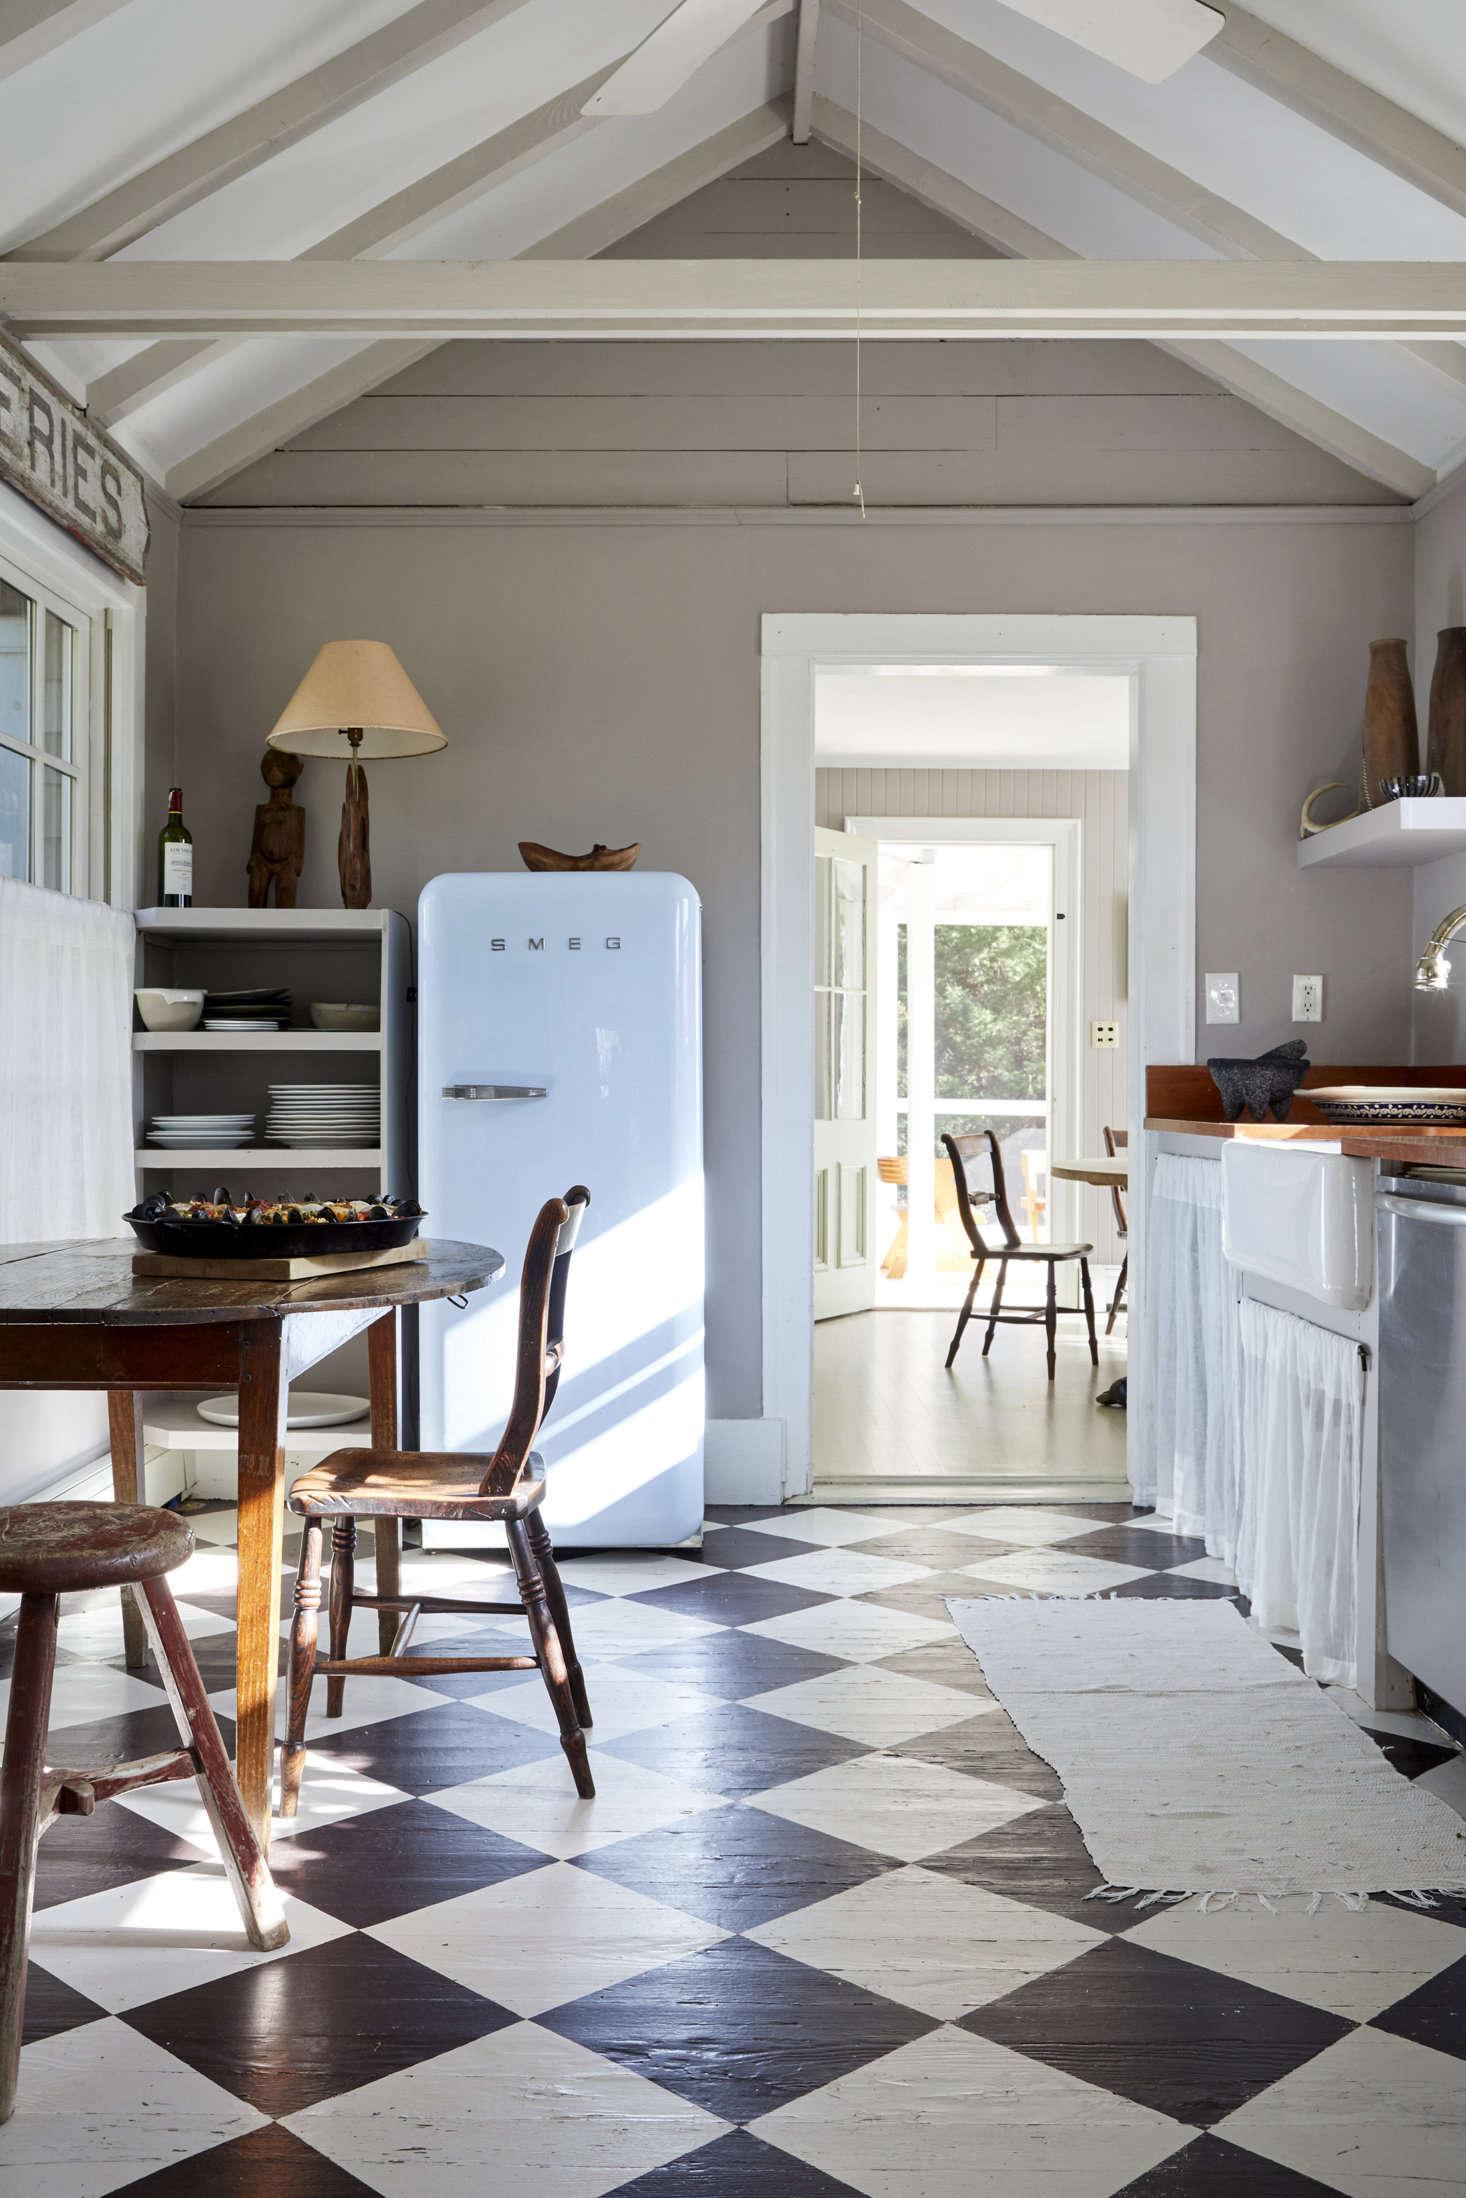 black and white floors with a smeg fridge and kitchen skirt